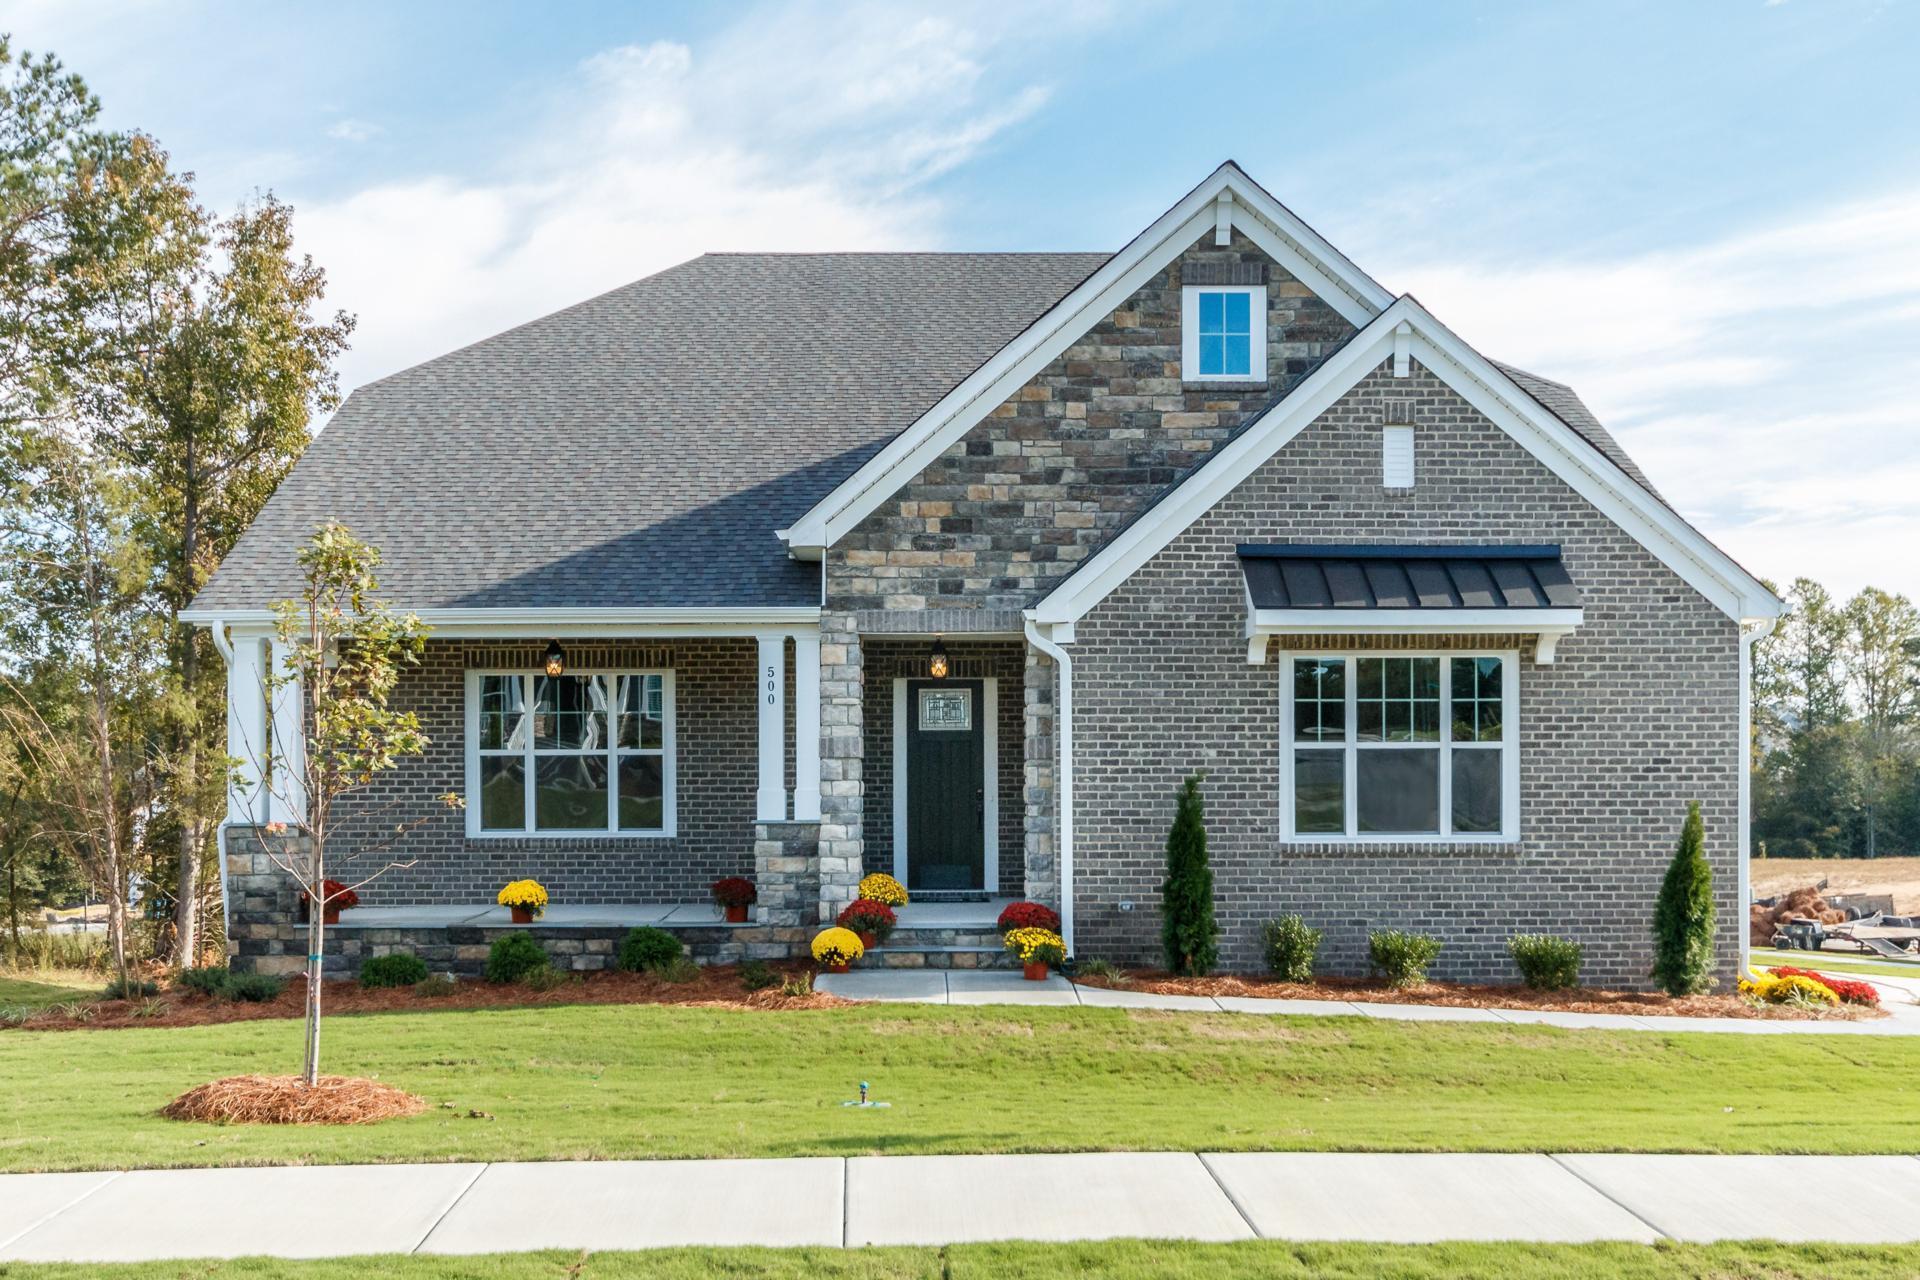 Single Family for Active at Woodbury 500 Adkins Ridge Road Rolesville, North Carolina 27571 United States